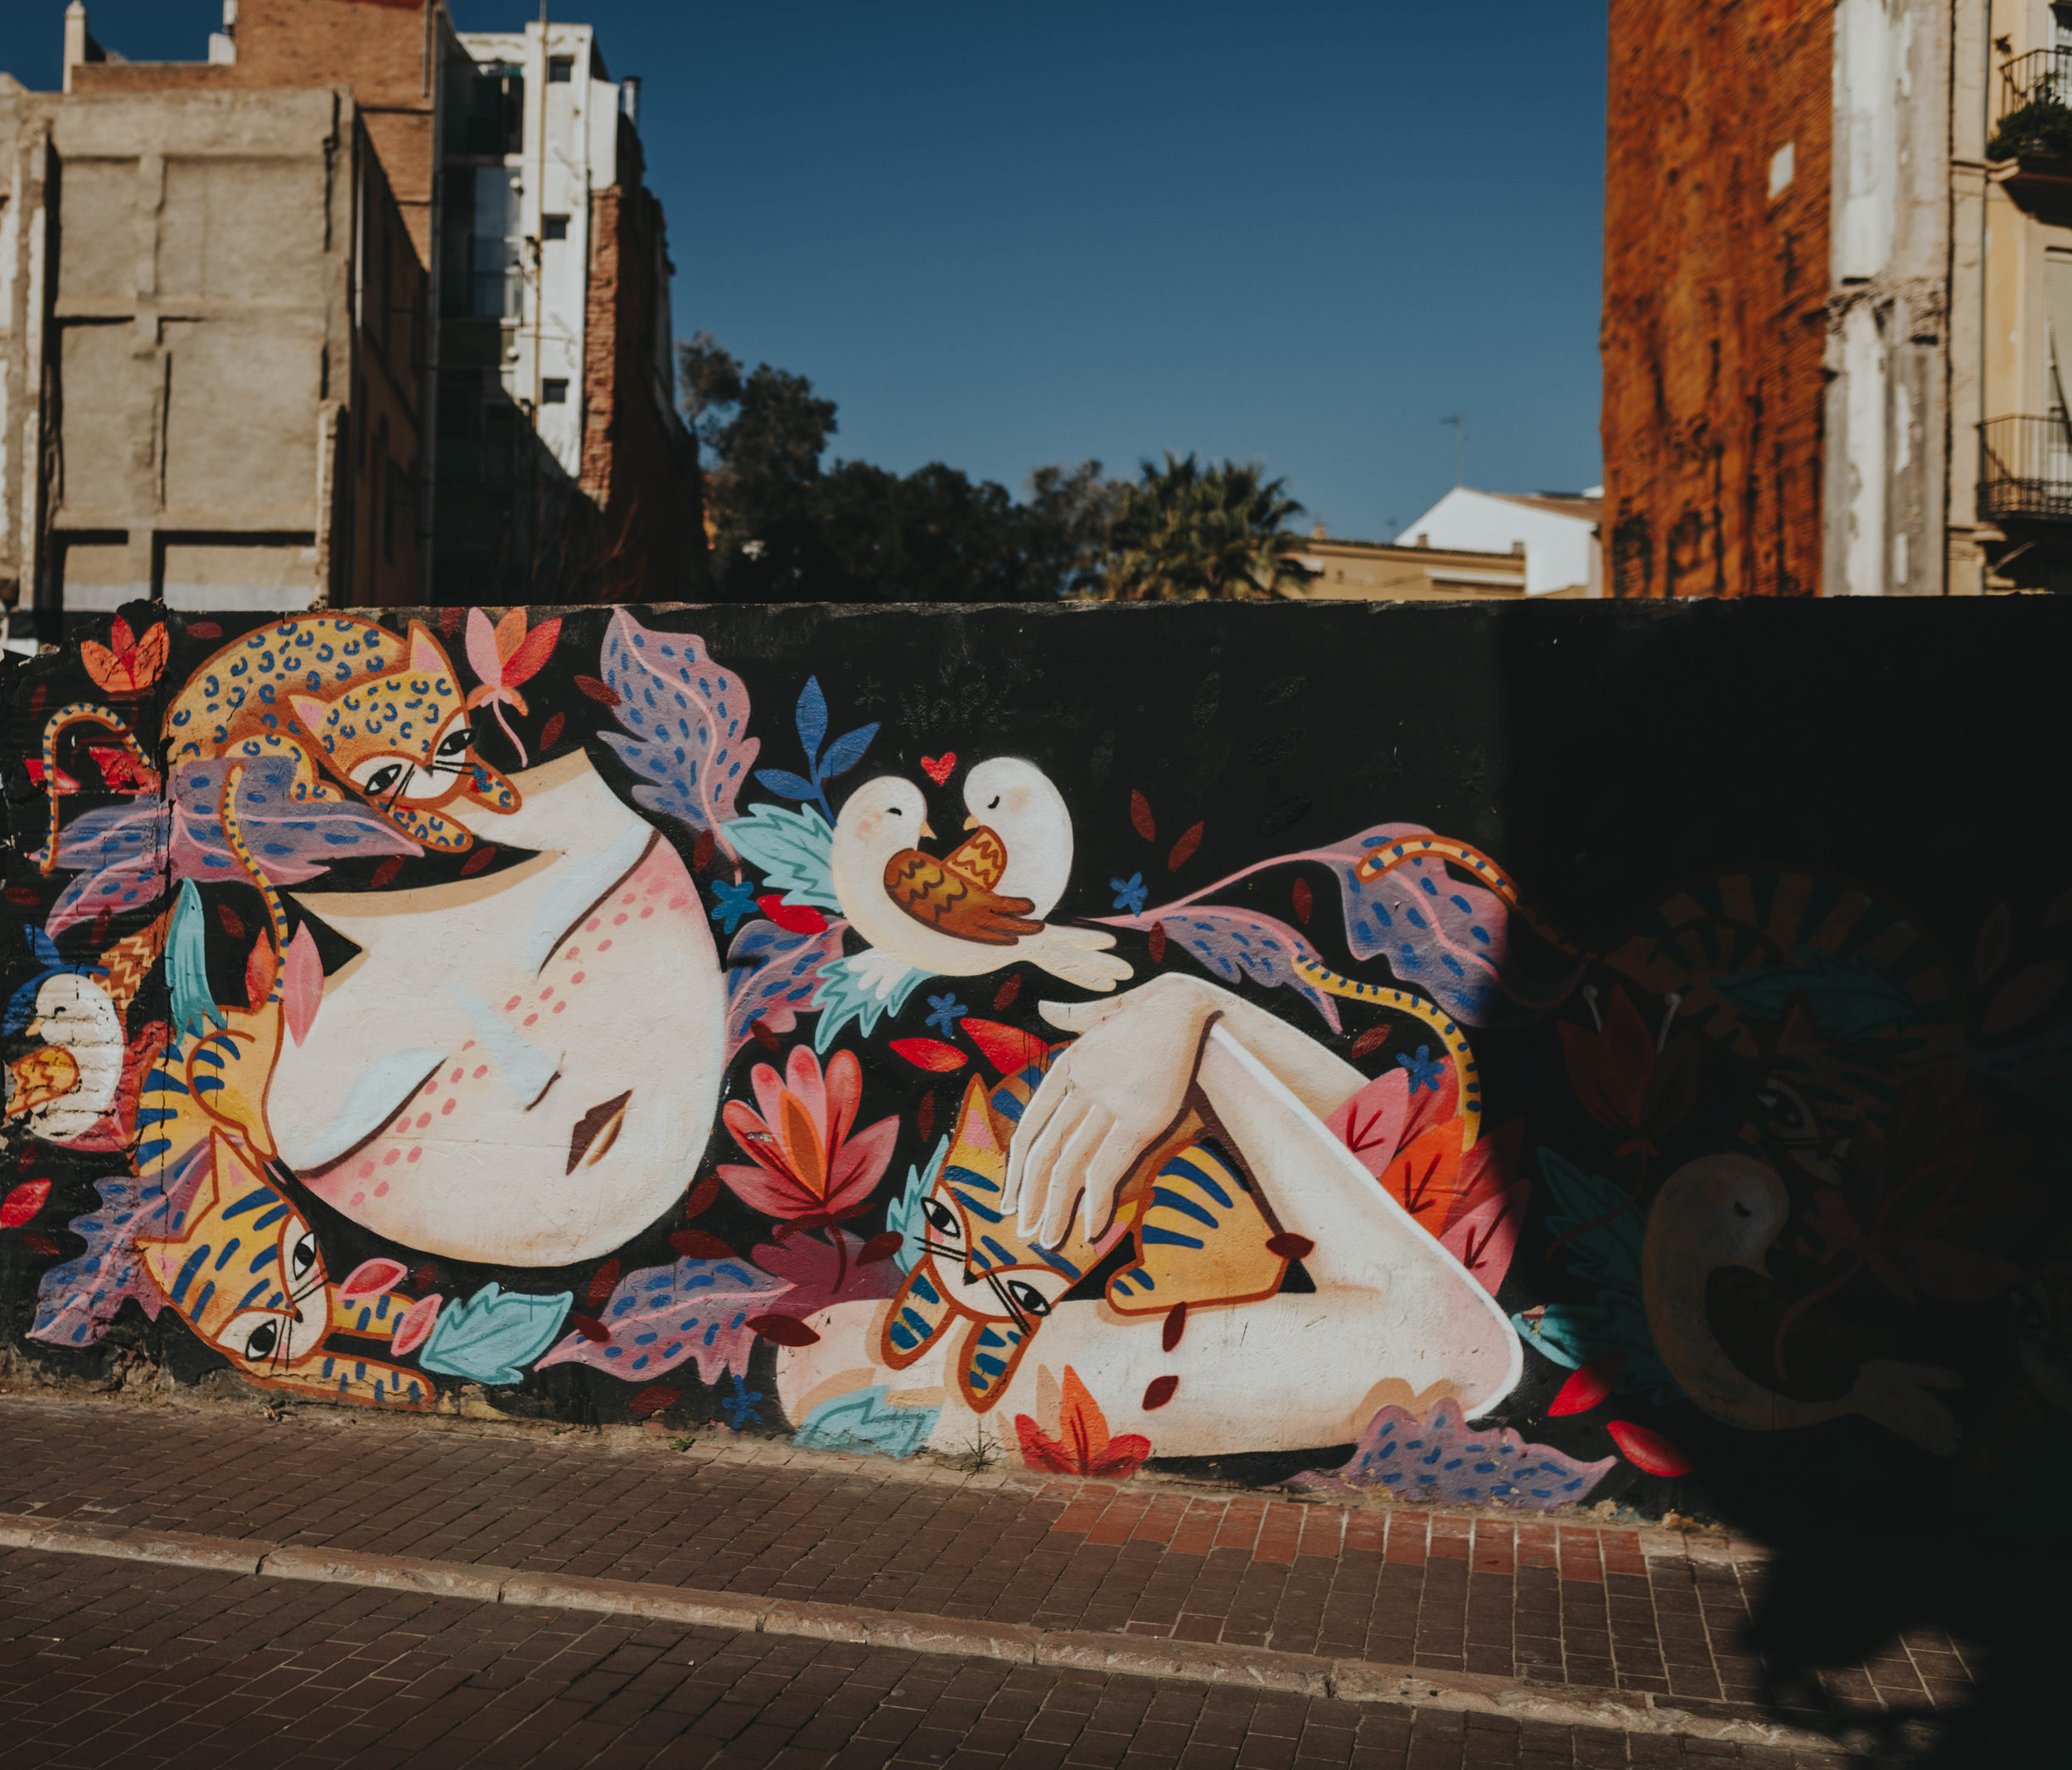 gorgeous graffiti artist work on art tour graffiti valencia Spain by day trip from Barcelona Nashville Based Photographer